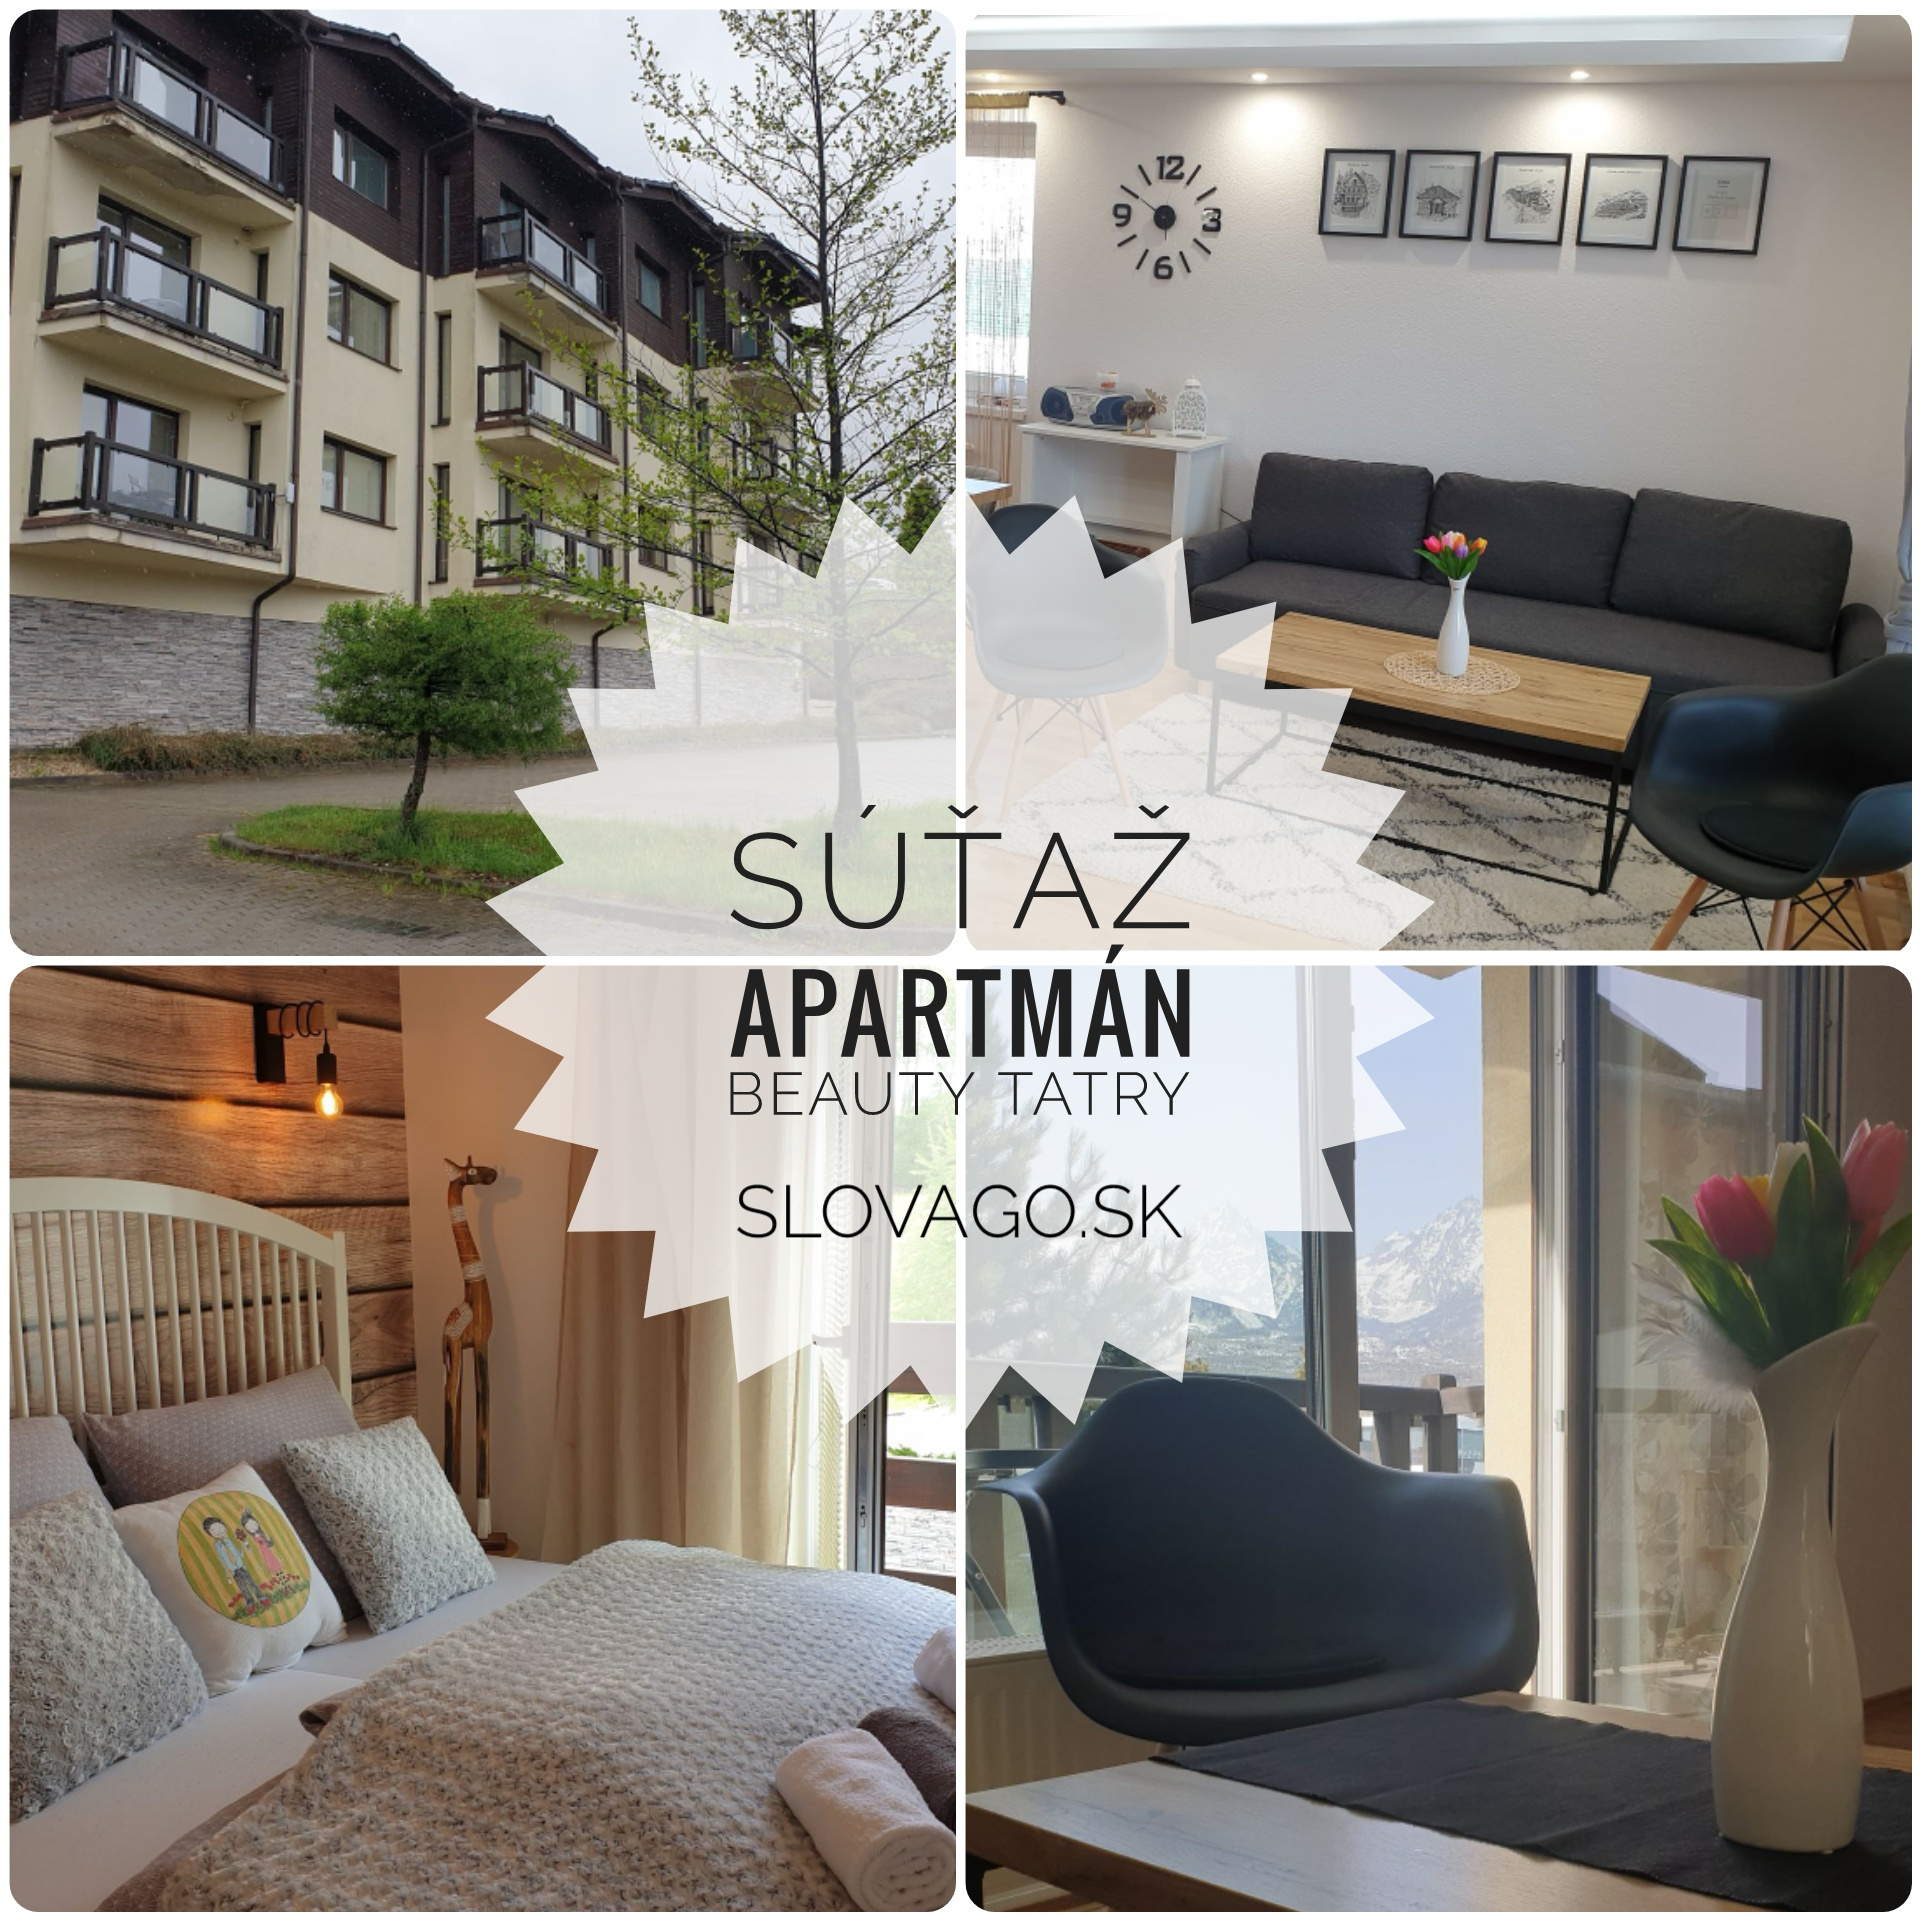 1630678374-Sutaz-FB-Apartman-Beauty-Tatry.jpeg